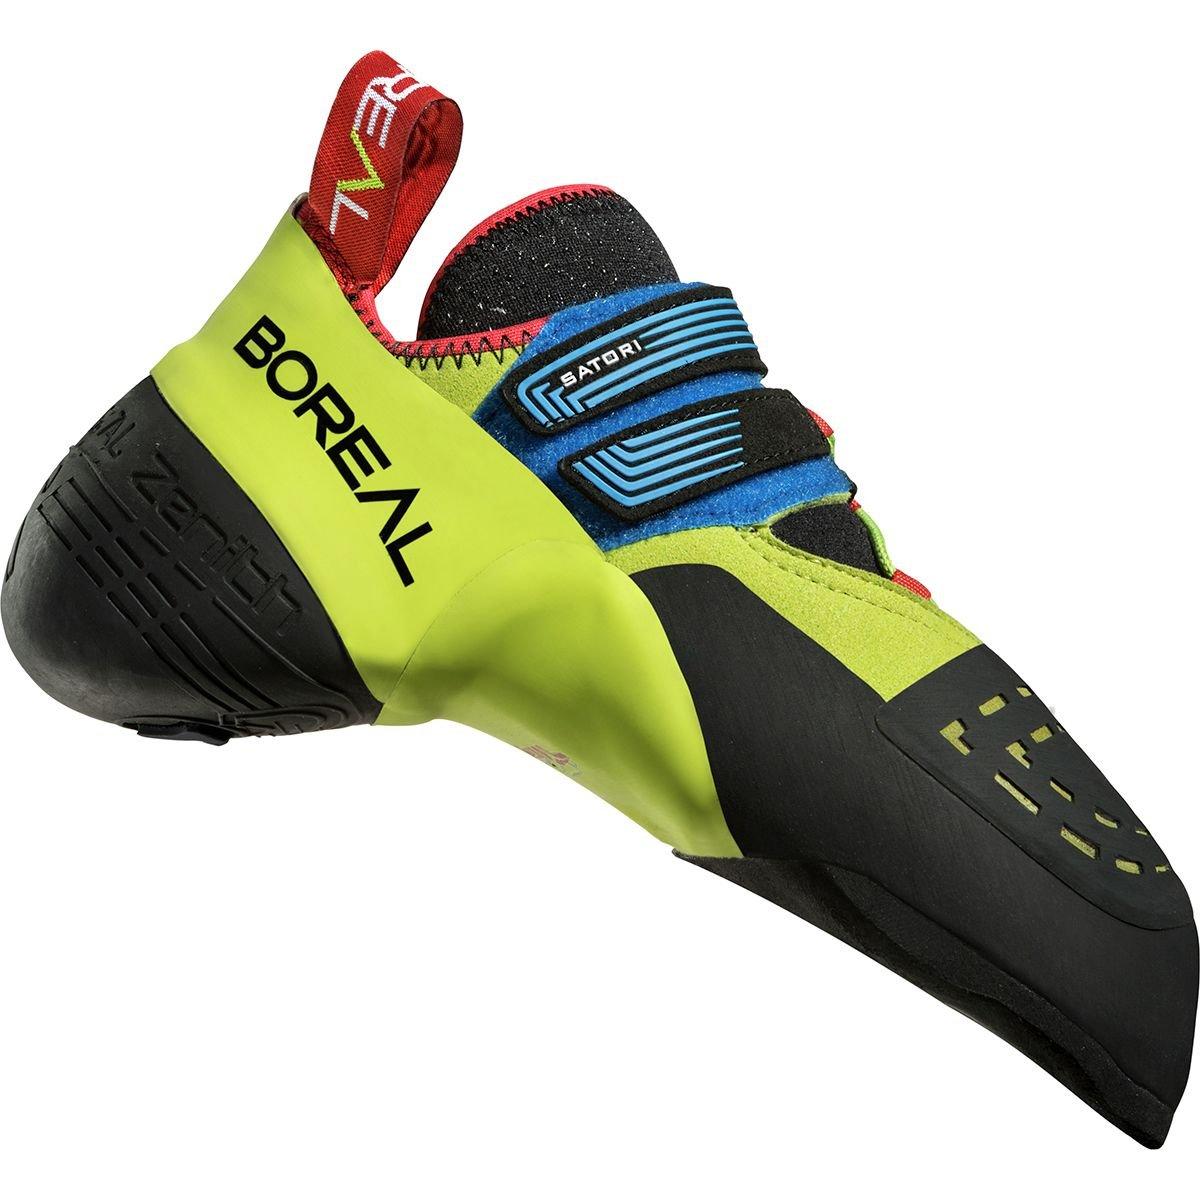 BOREAL Herren Satori Multisport Indoor Schuhe